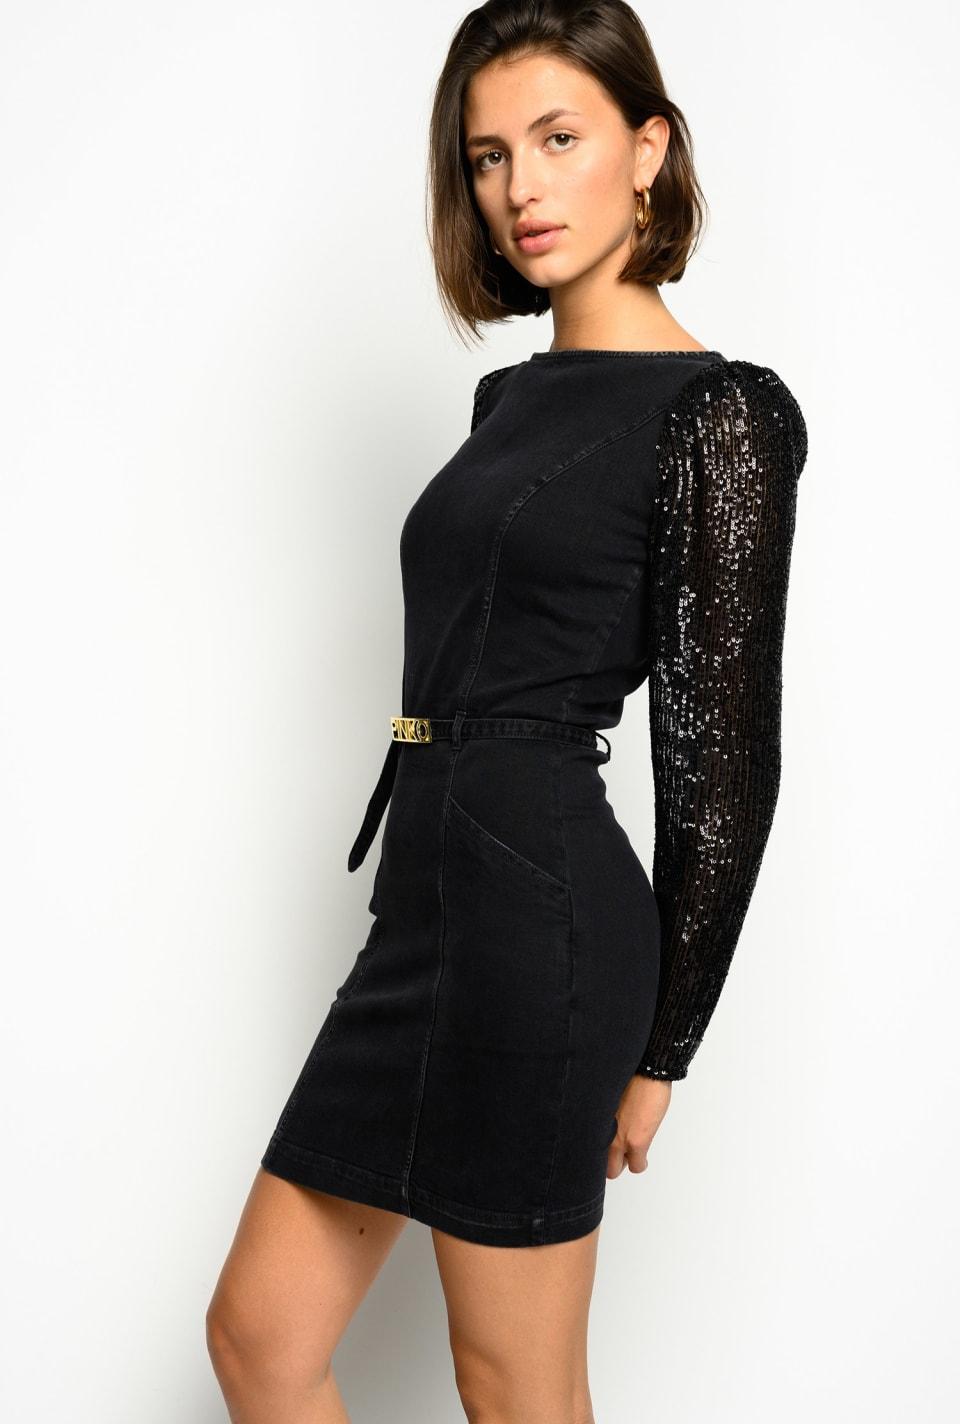 Denim sheath dress with sequin sleeves